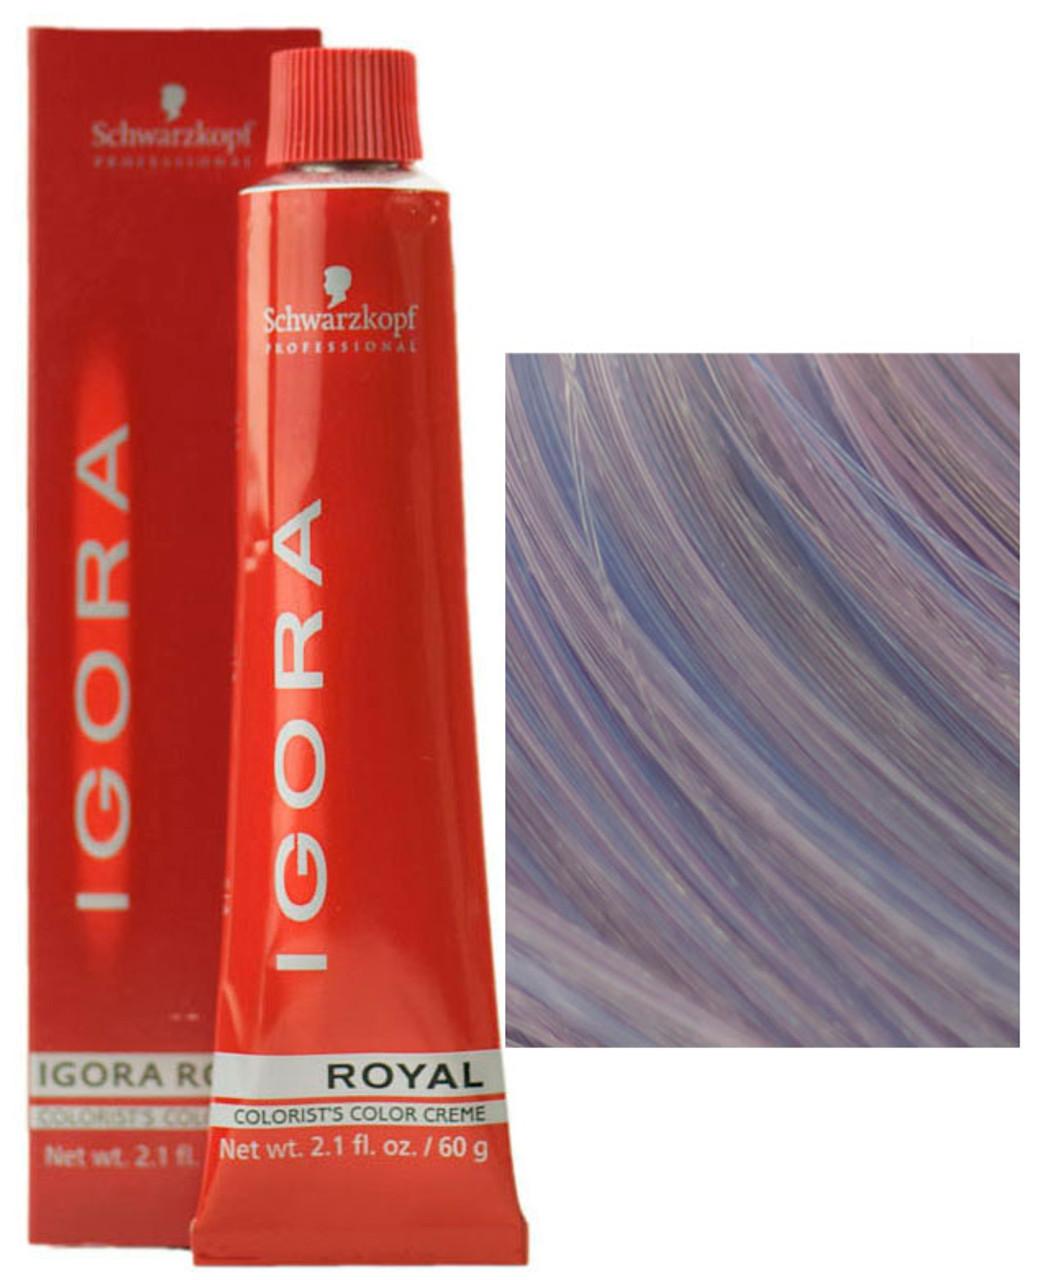 Schwarzkopf Professional Igora Royal Hair Color Sleekshop